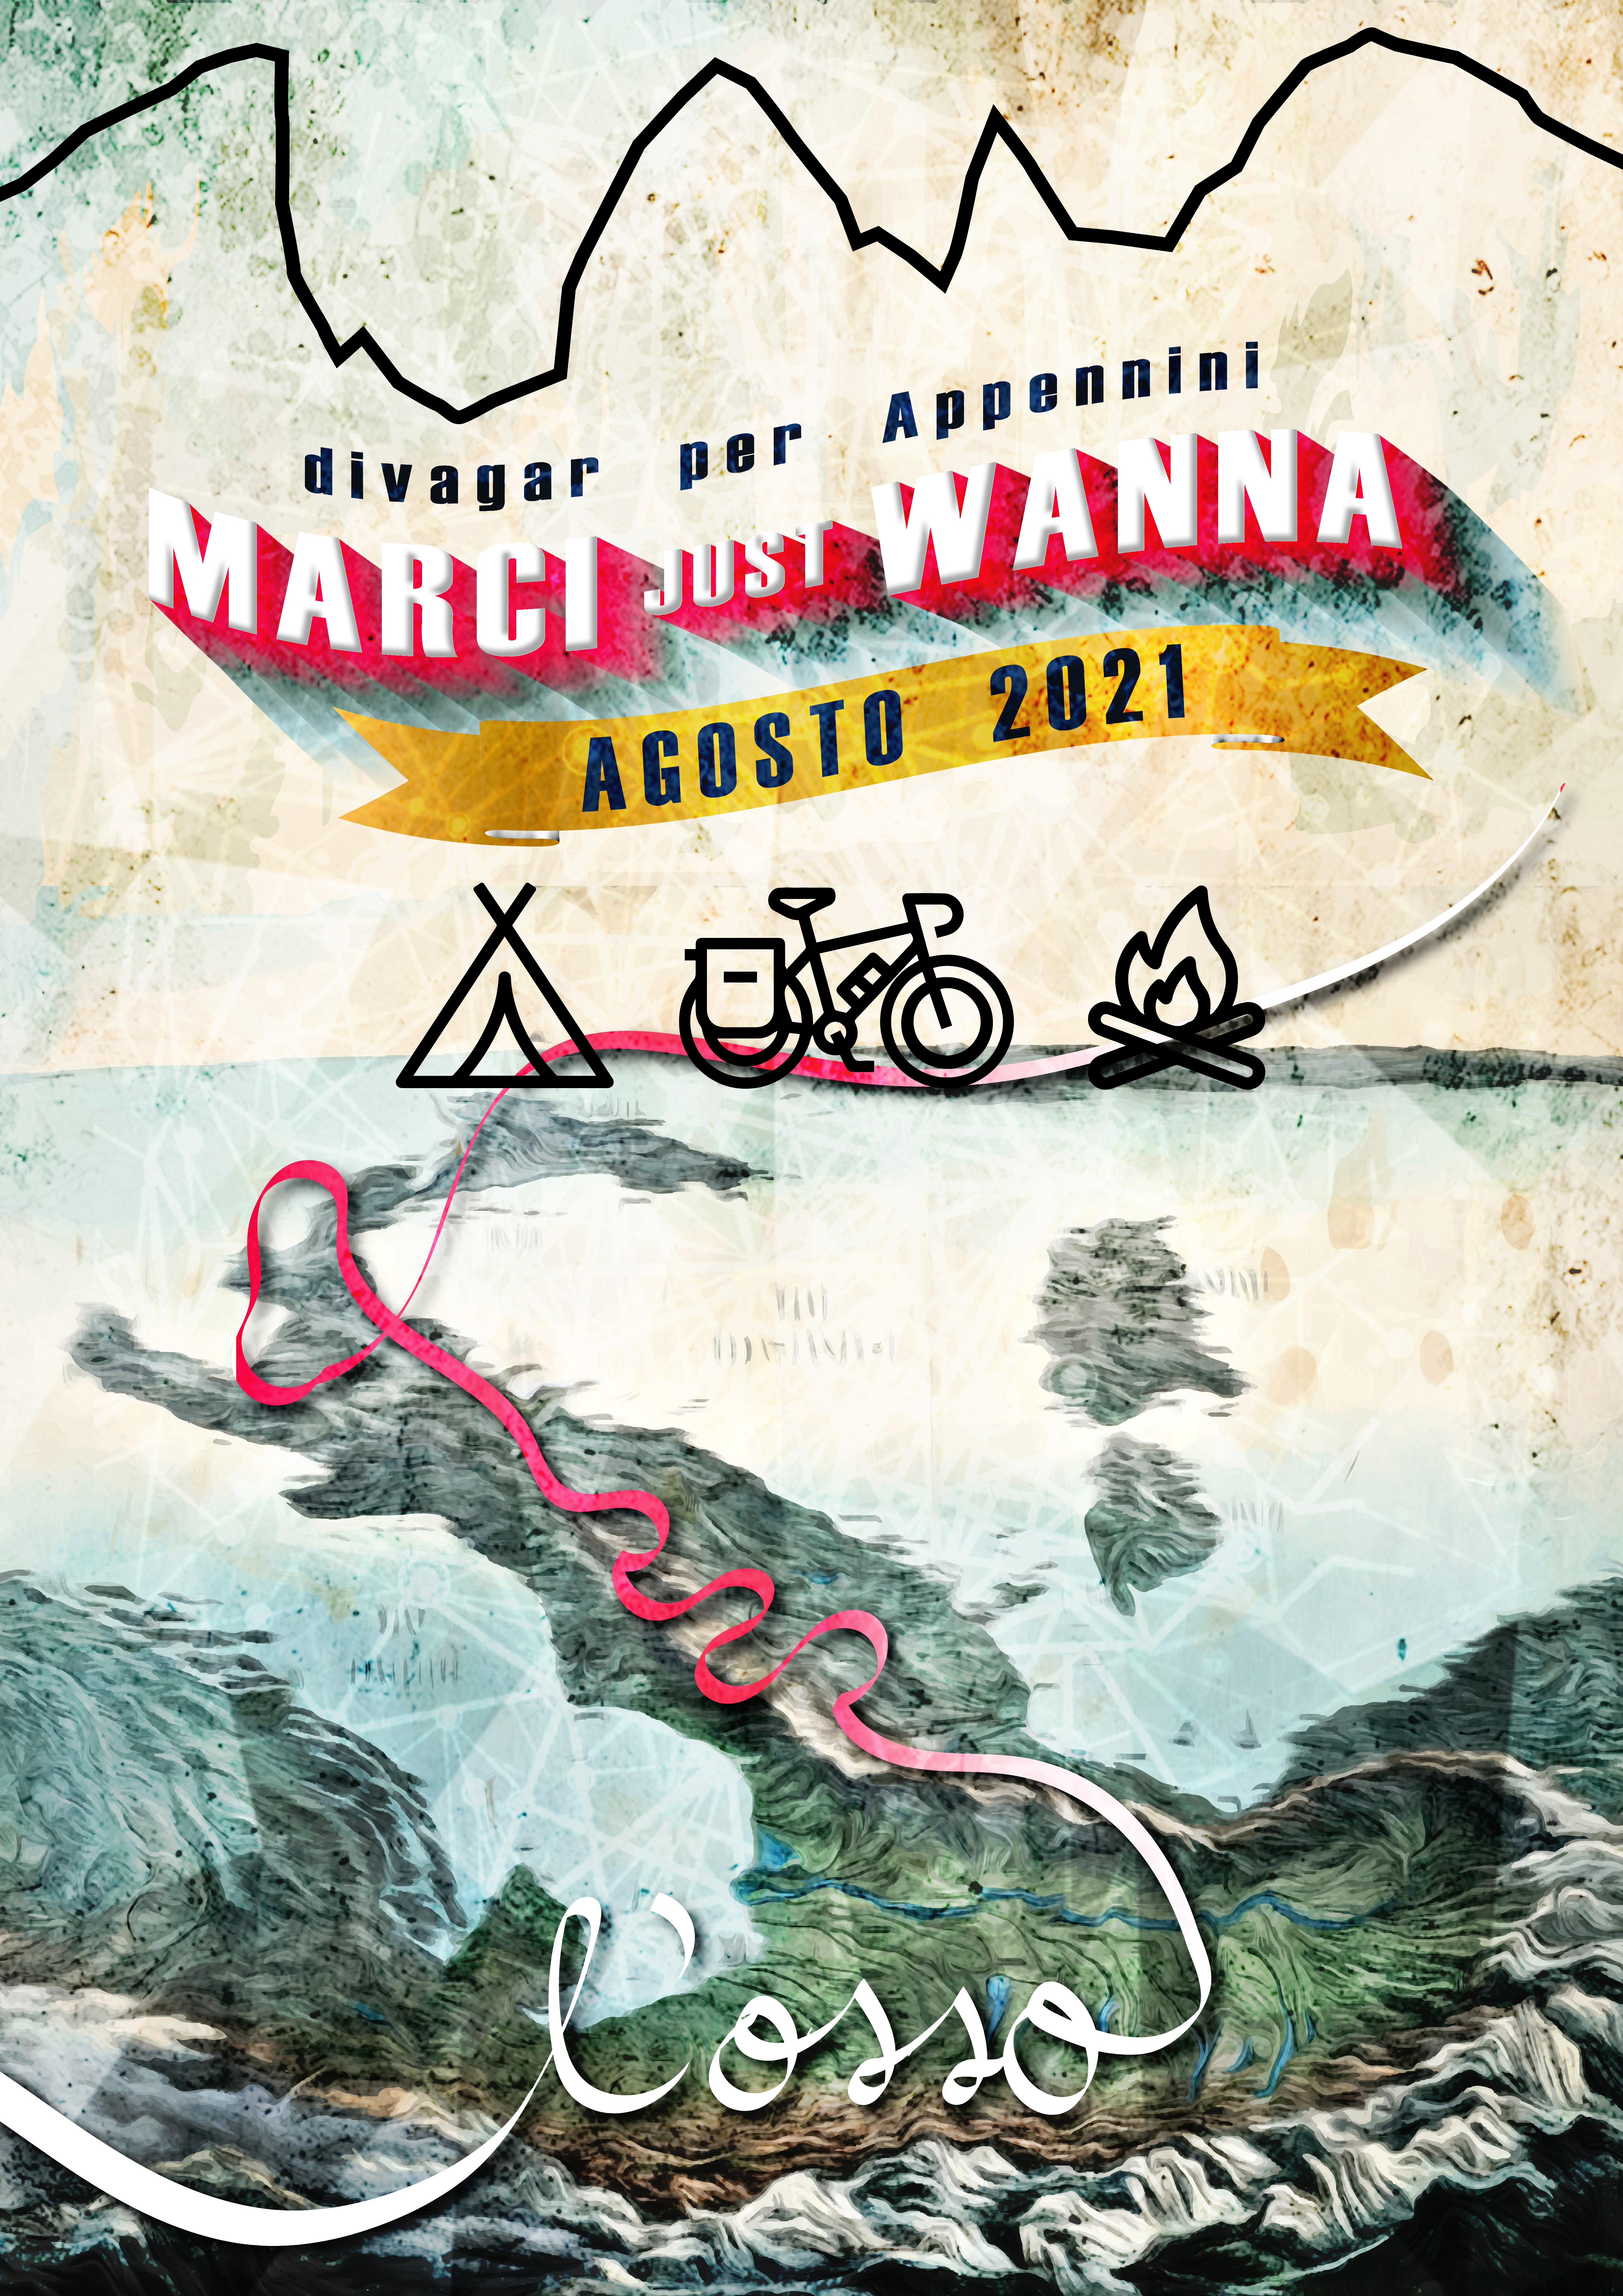 Cover Marci JustWanna_L'Osso